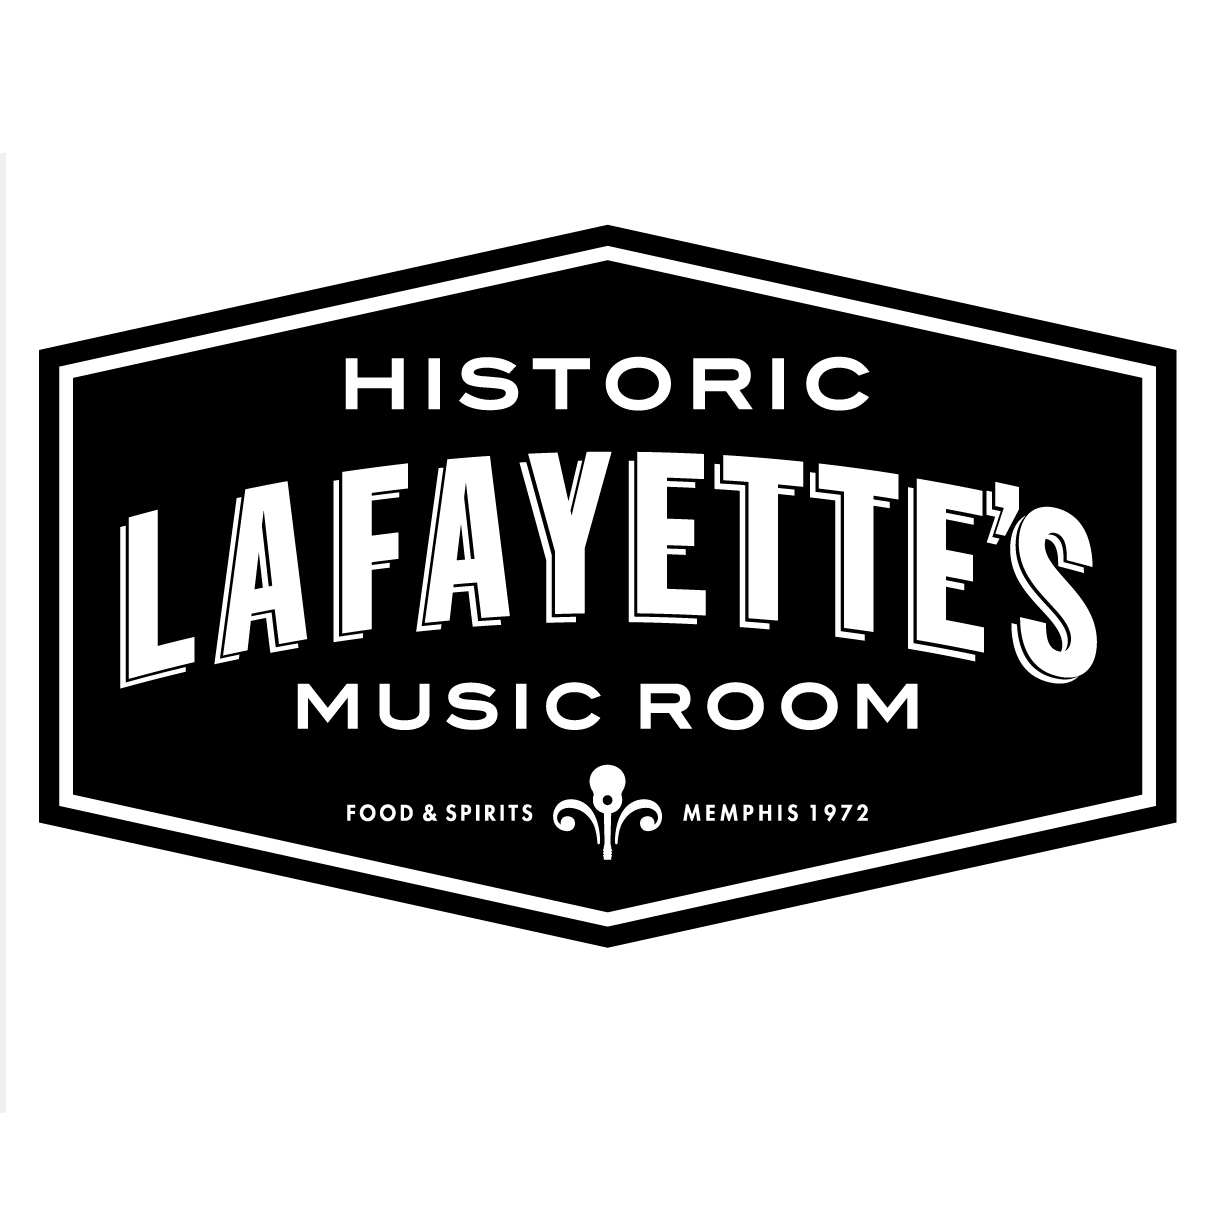 Lafayettes Music Room Logo